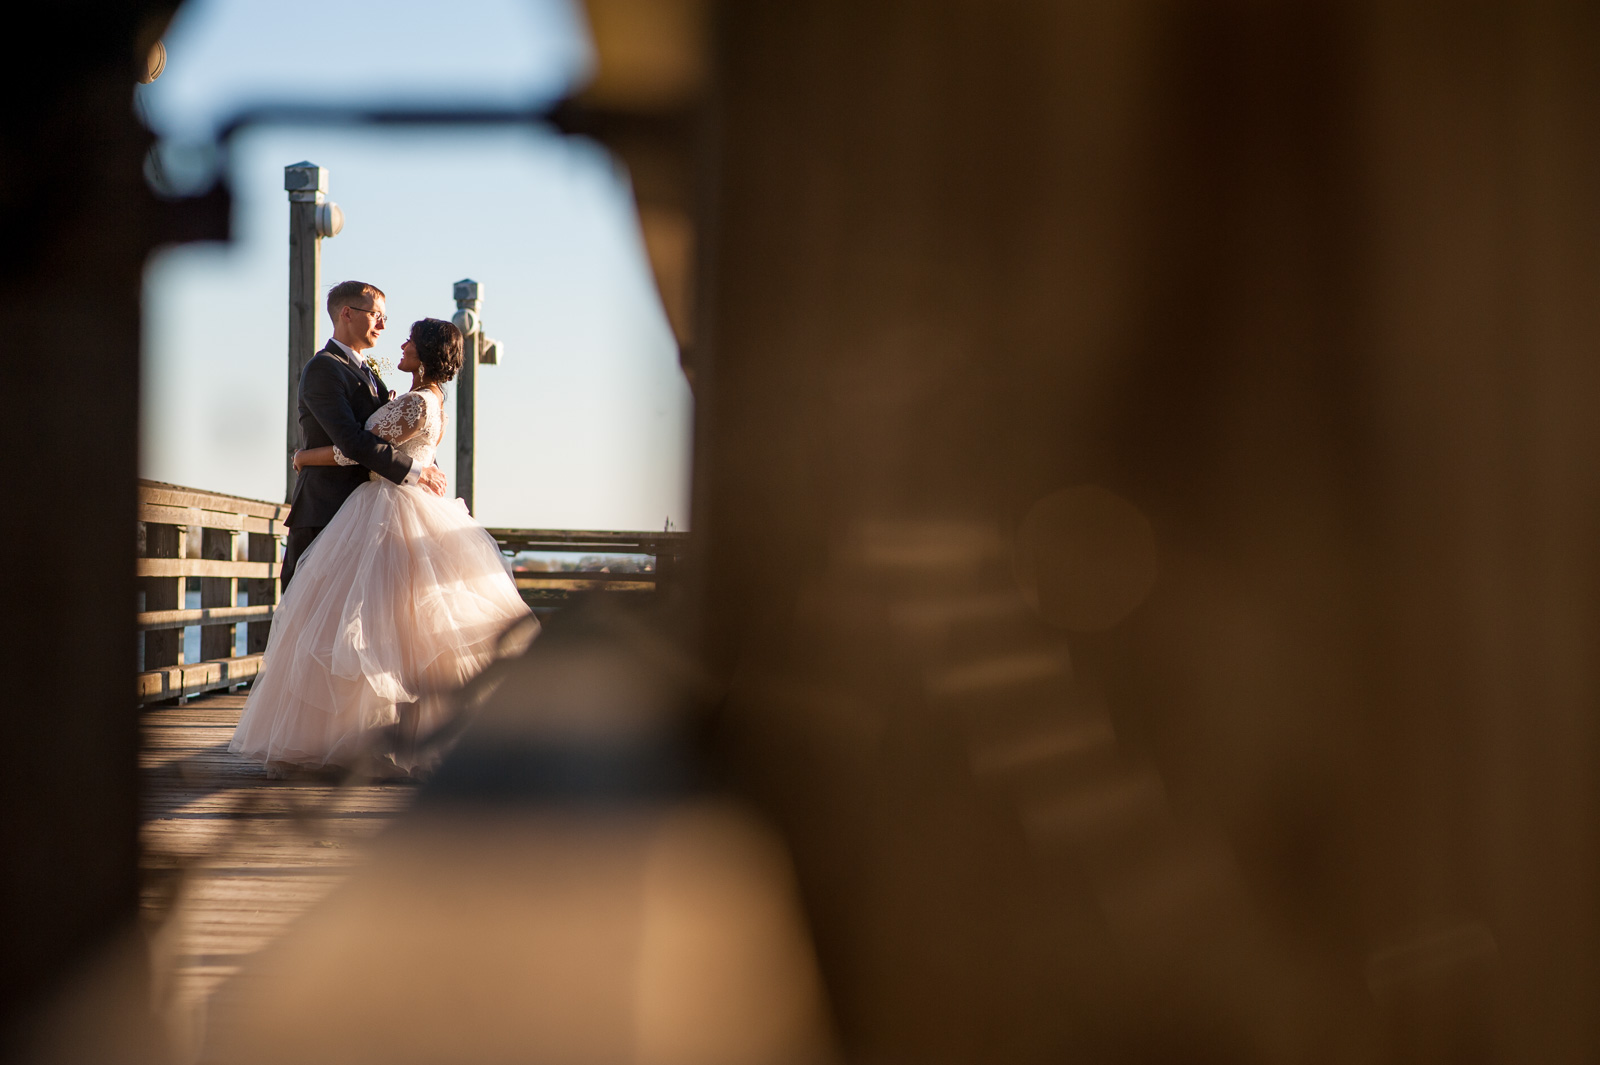 bc-wedding-photographers-paradise-banquet-hall-wedding-25.jpg